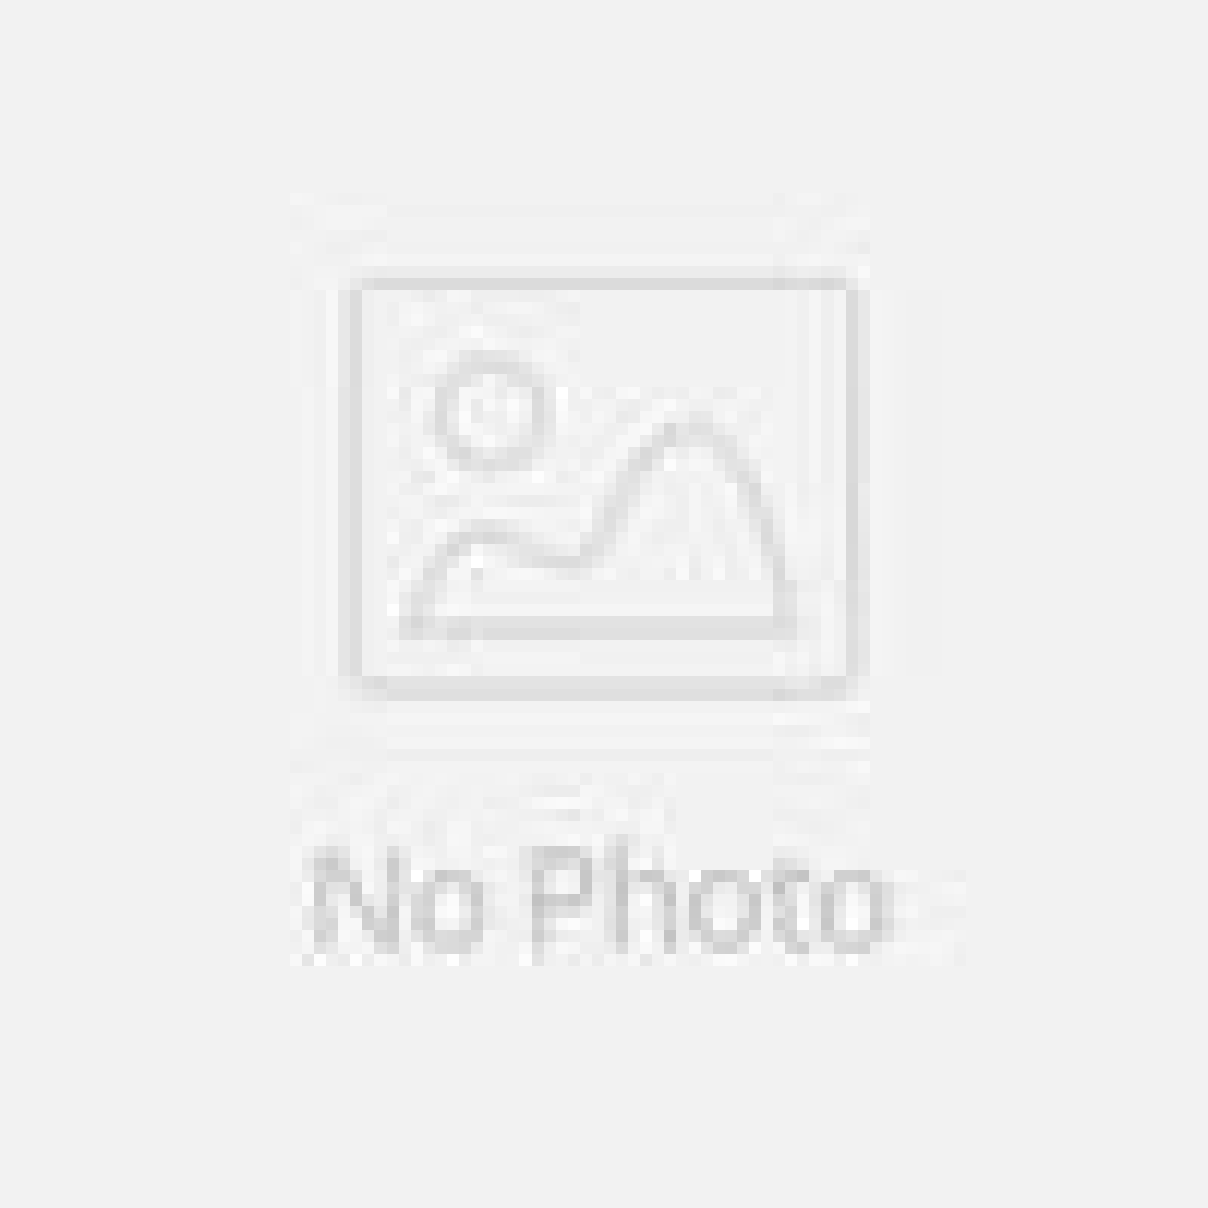 Женское платье 2015 Vestidos Vestido V Aierwill женское платье booming jelly v 2015 vestido vestidos 141029 page 2